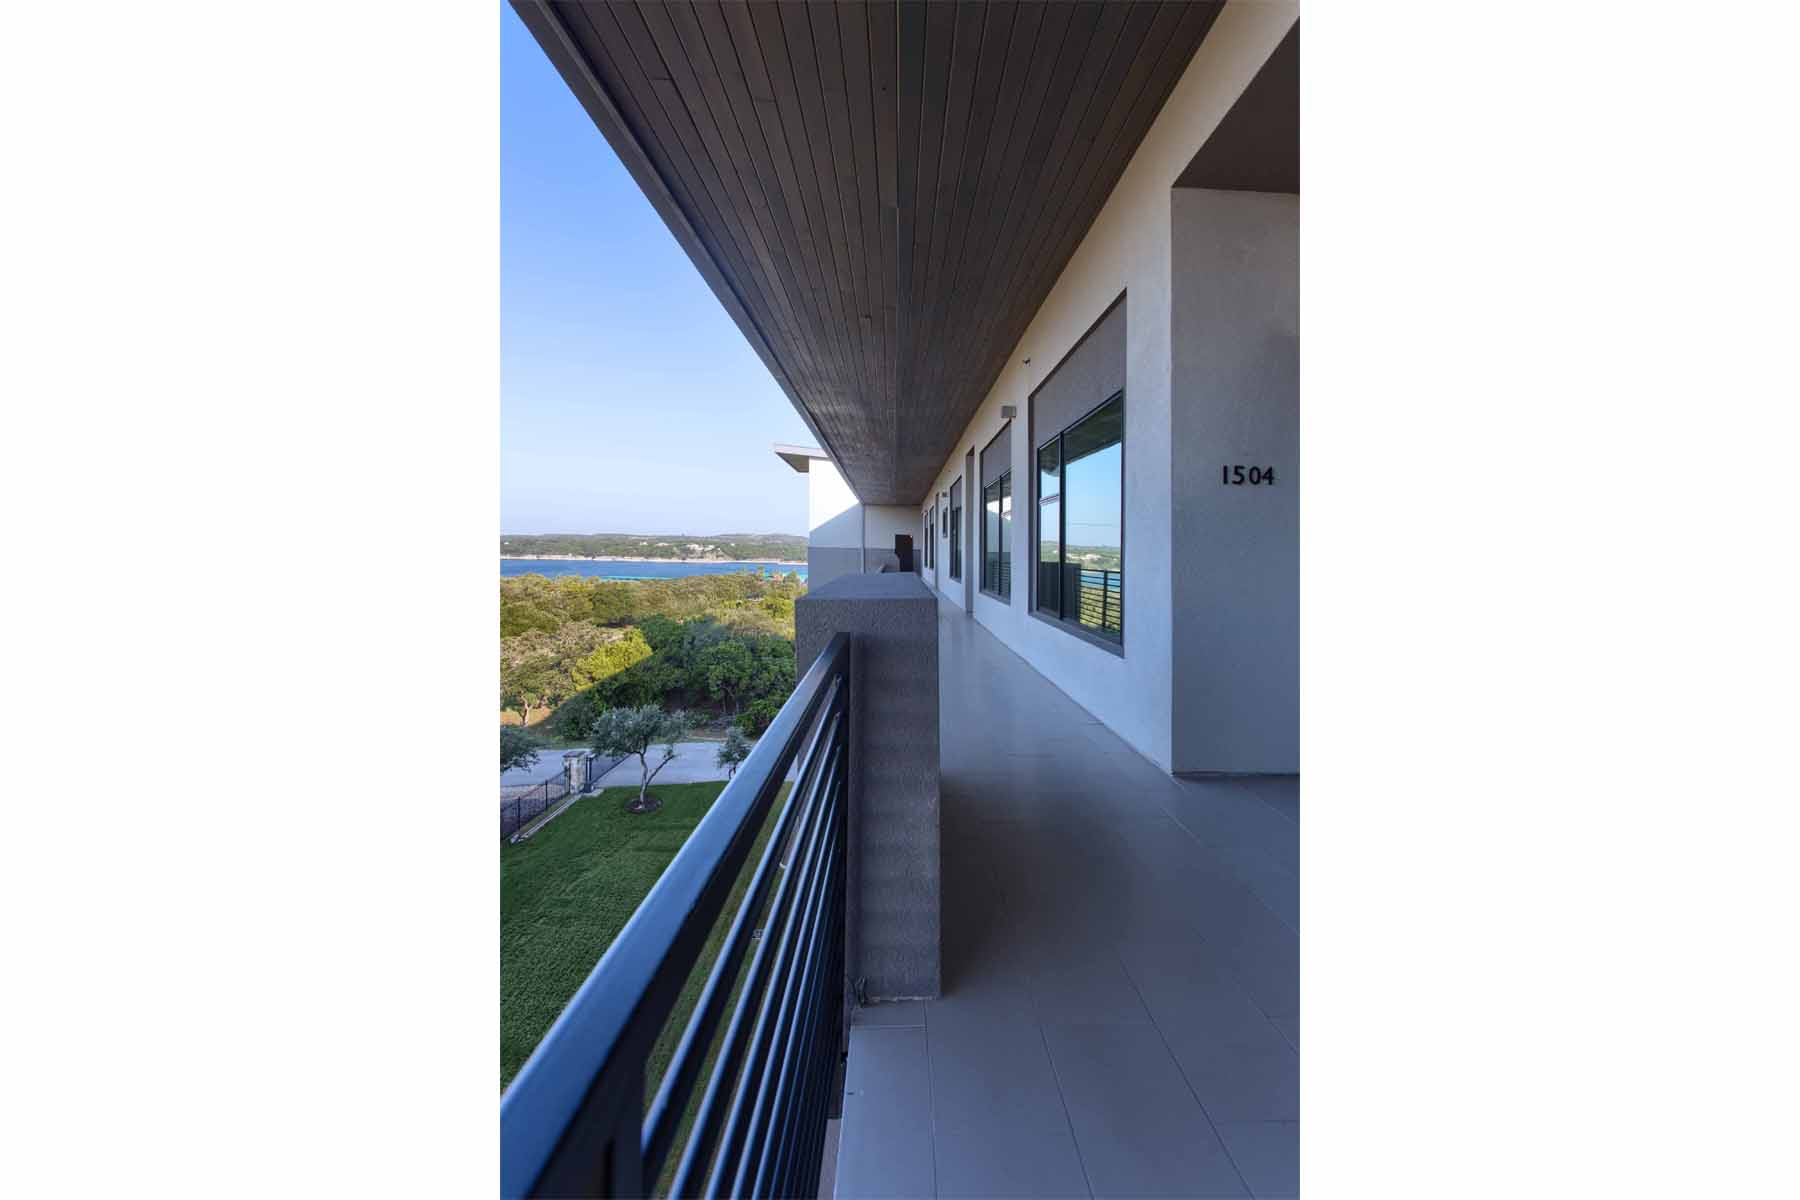 waterfall-condominiums-patio-view